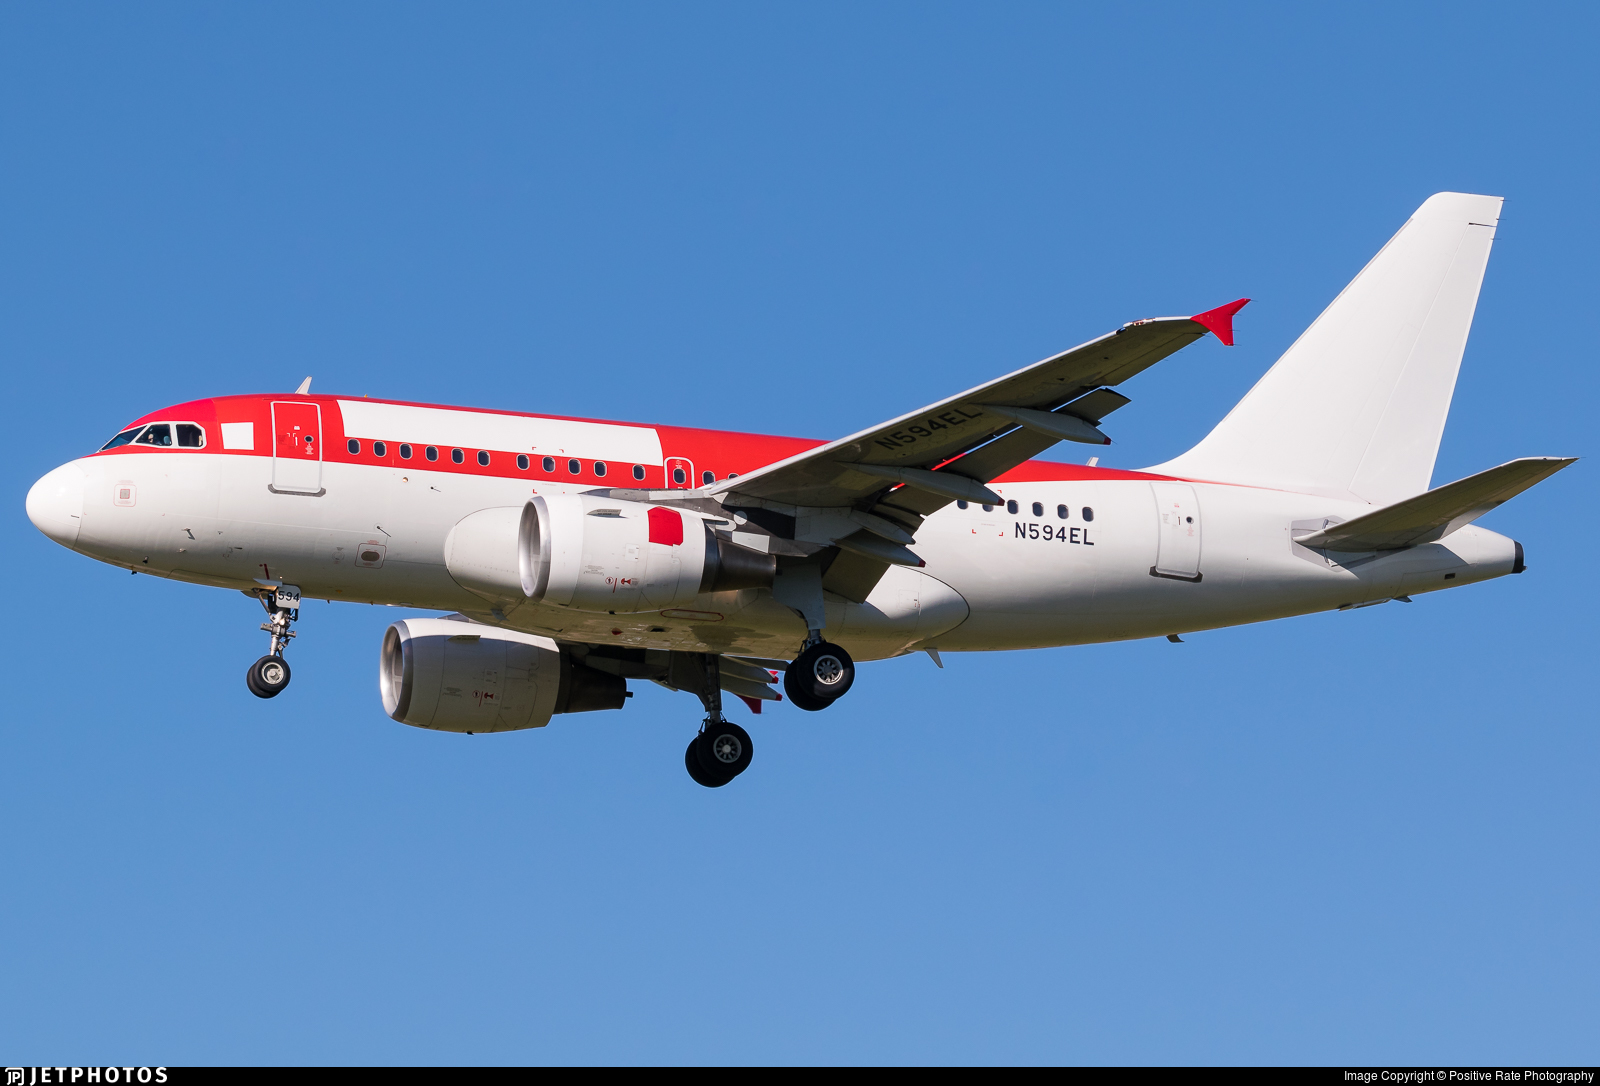 N594EL - Airbus A318-111 - Untitled